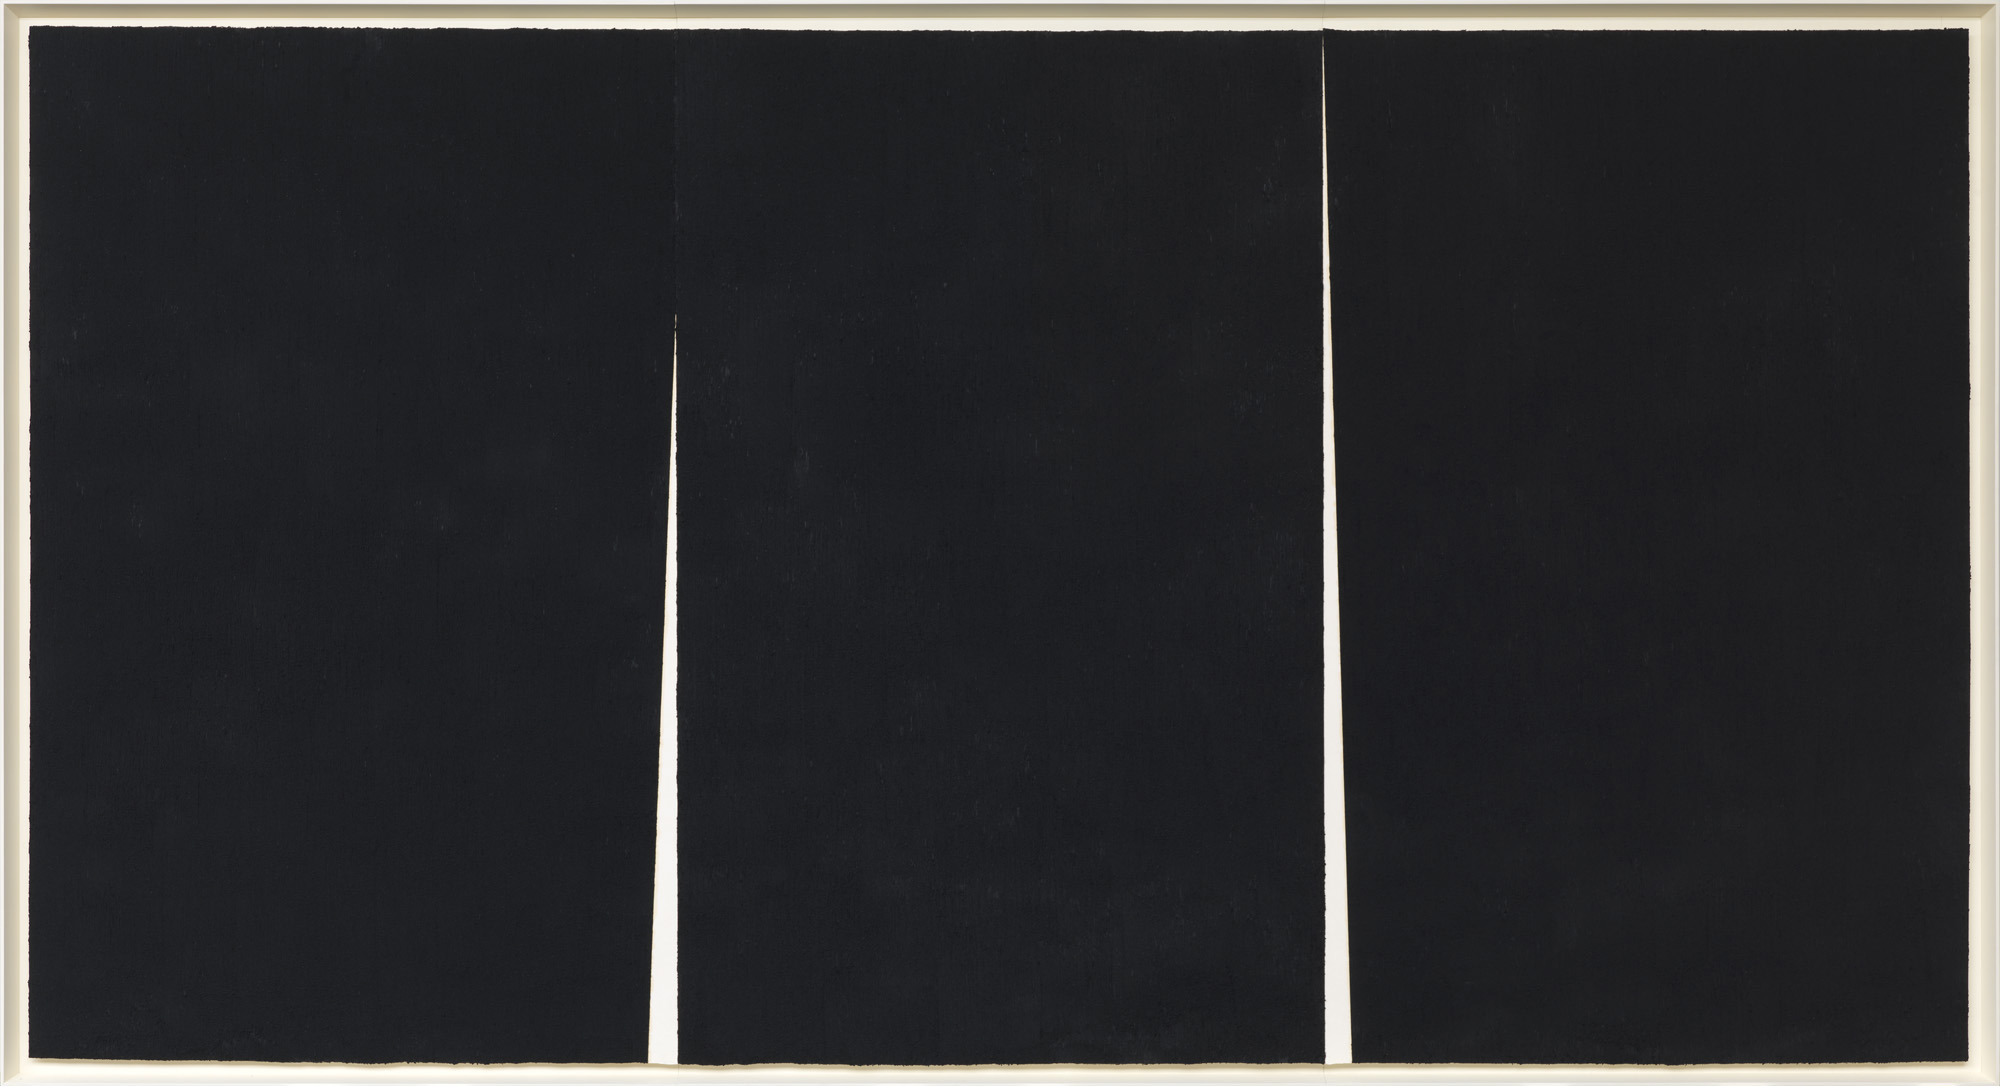 Double Rift #5, 2012. Paintstick on handmade paper, 114 x 211 1/2 inches (289.6 x 537.2 cm)